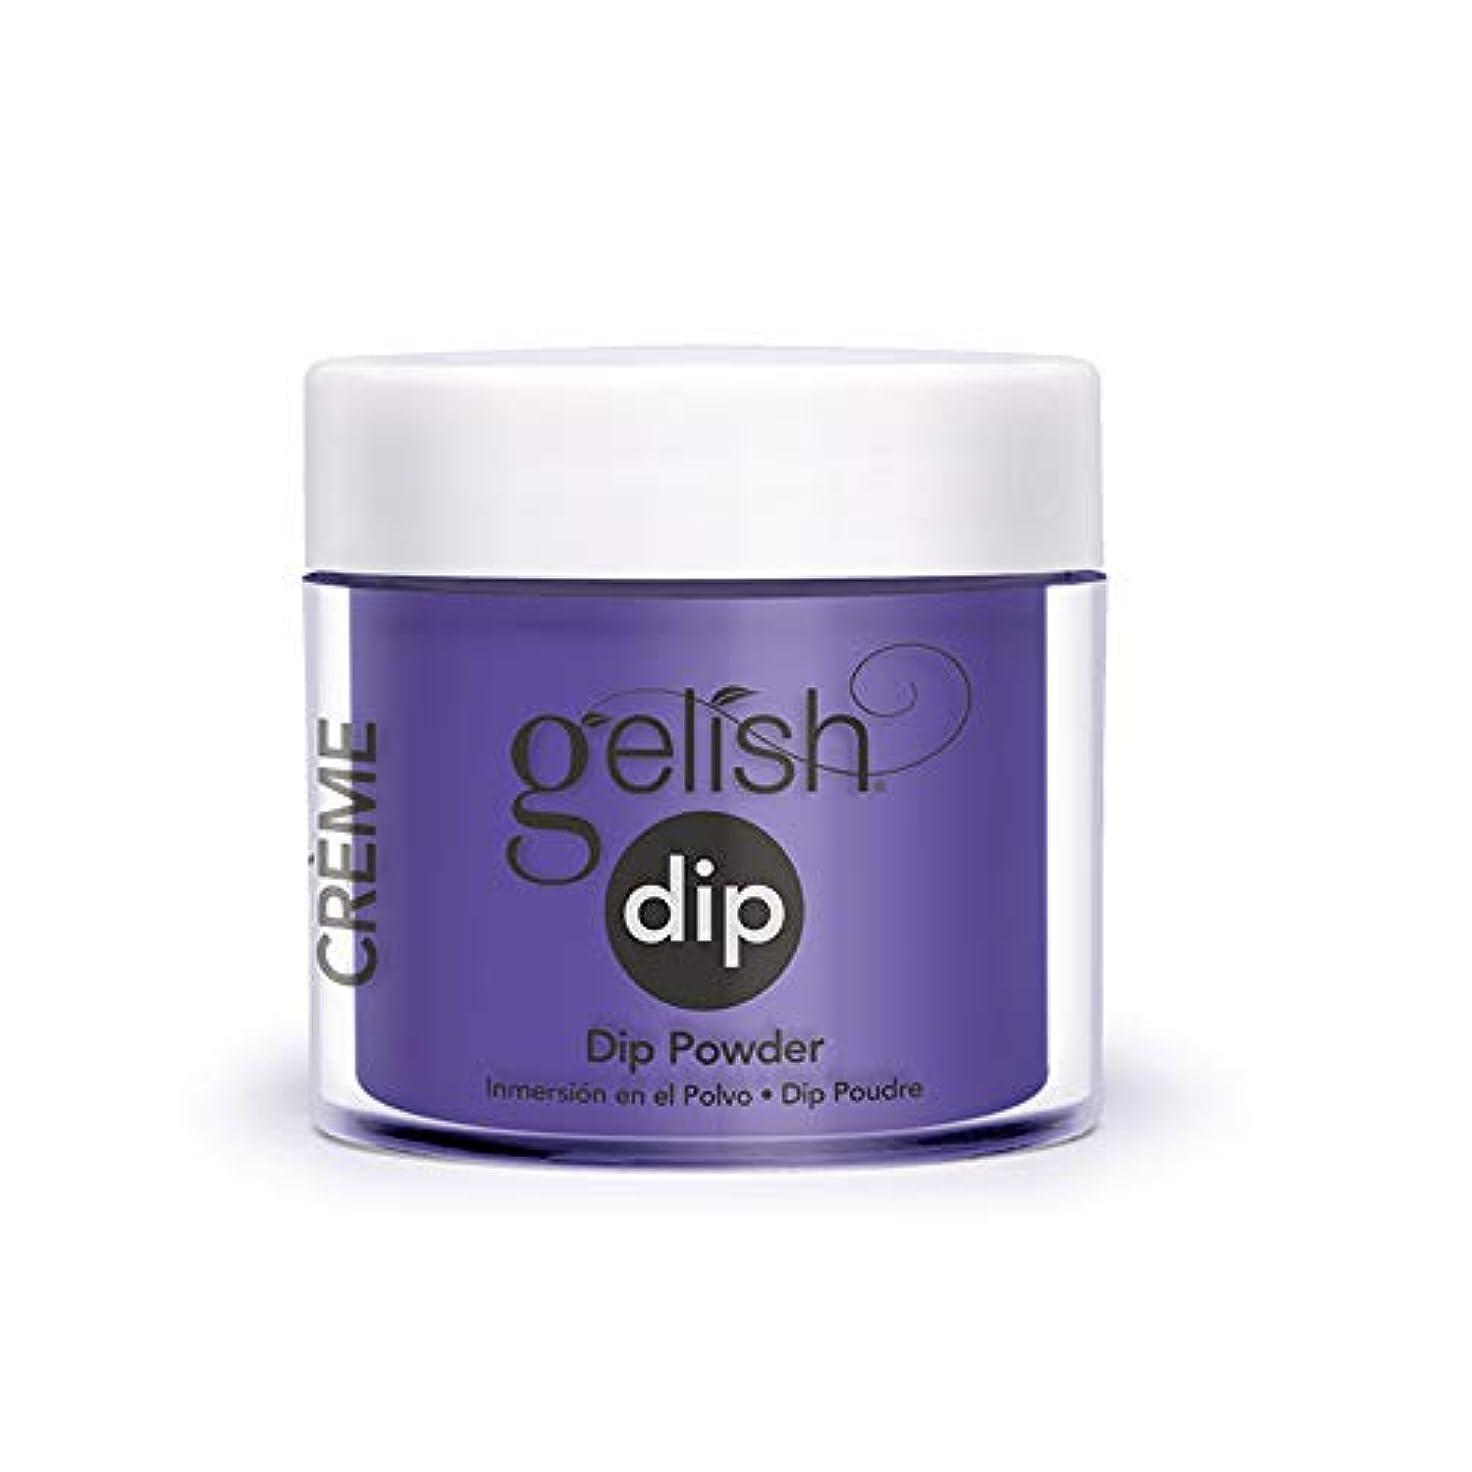 Harmony Gelish - Acrylic Dip Powder - Anime-Zing Color! - 23g / 0.8oz